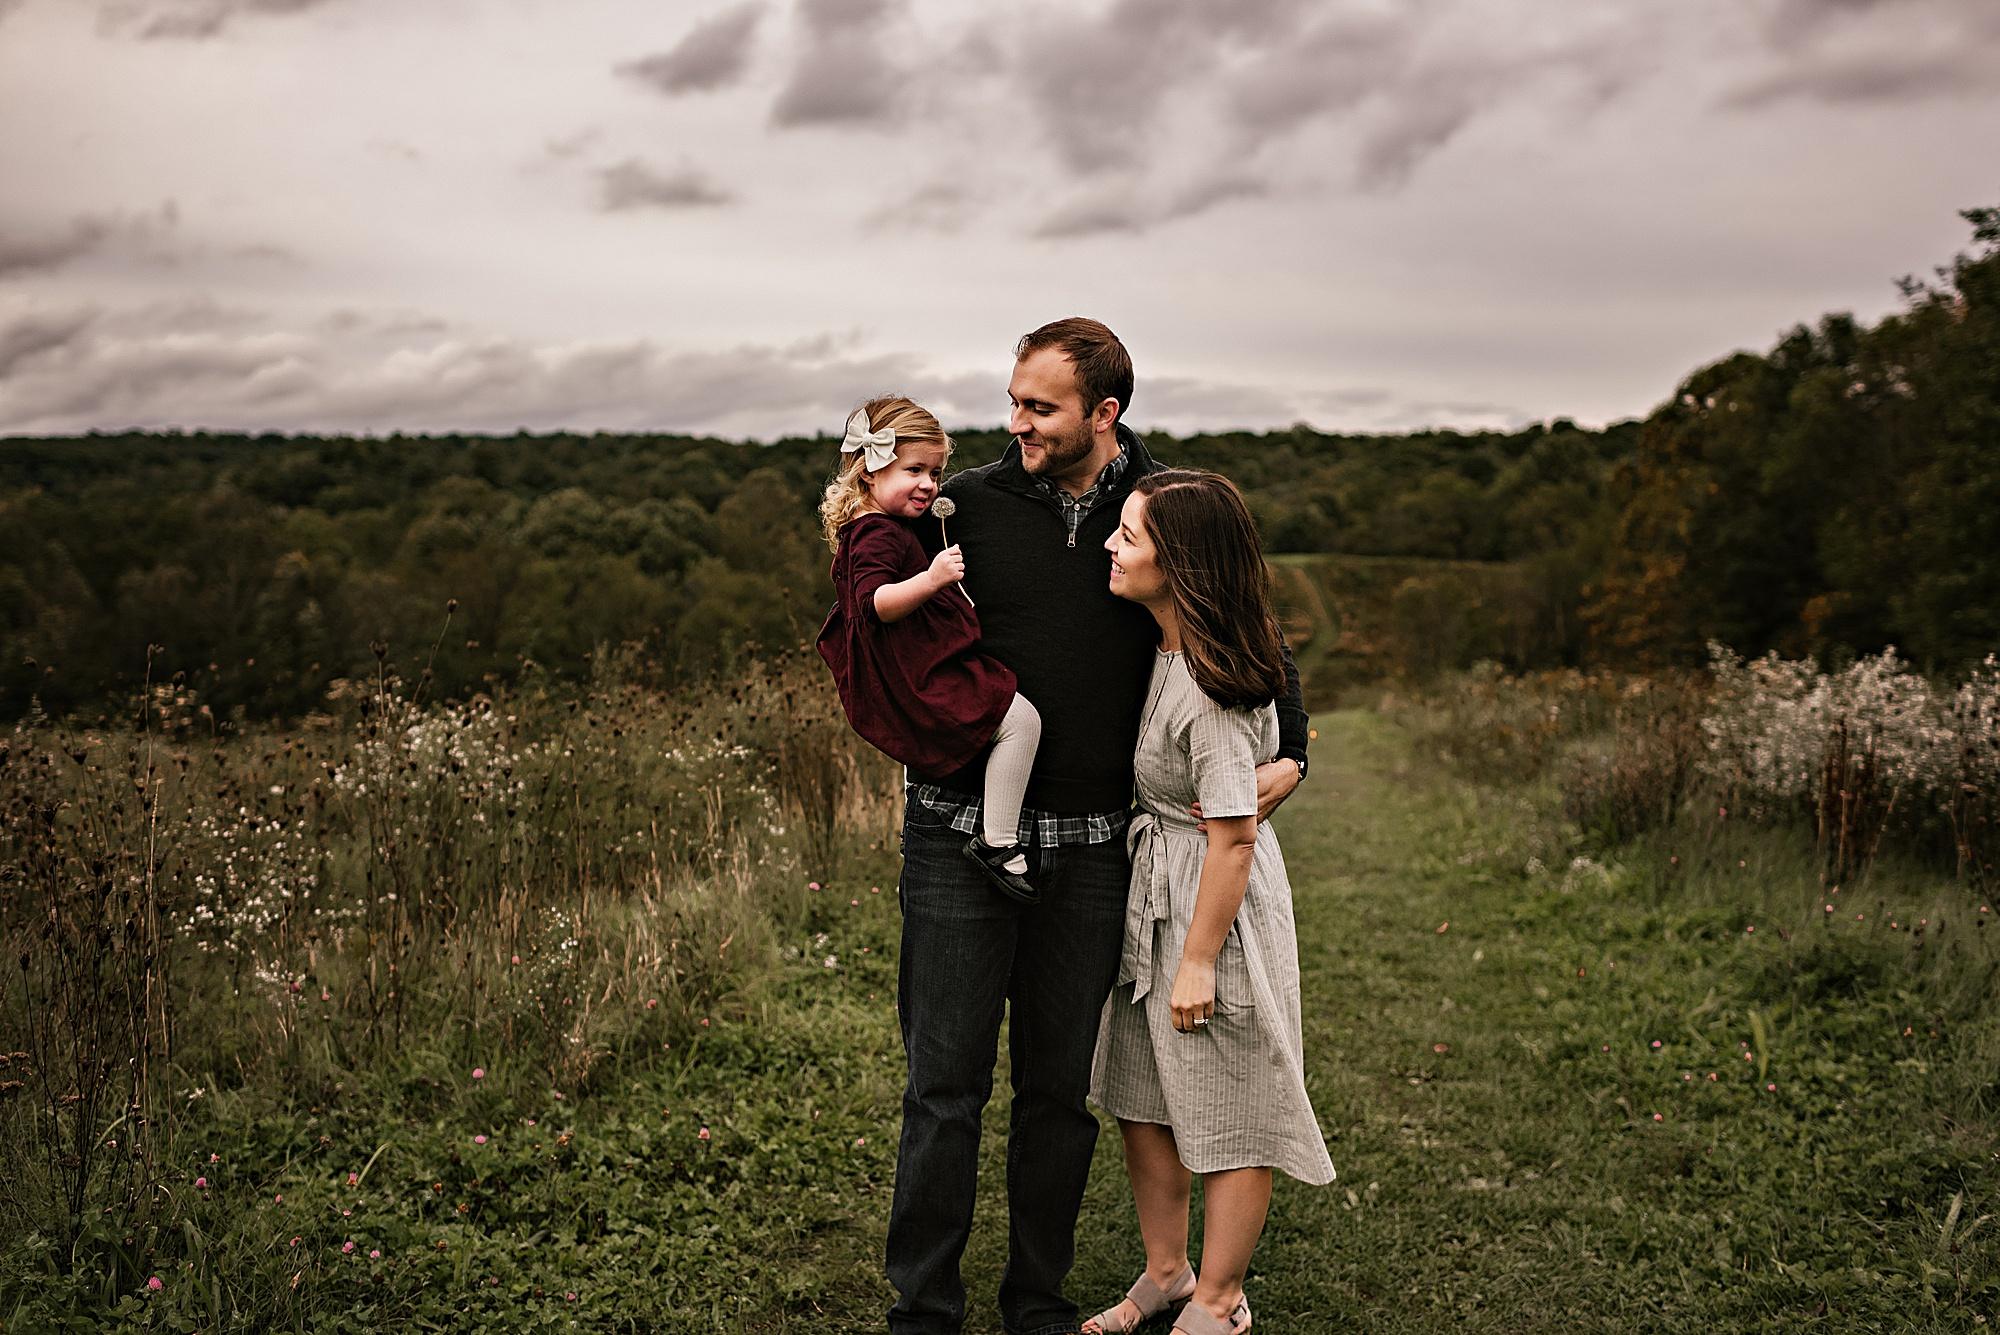 lauren-grayson-photography-akron-ohio-maternity-session-fall-hammer_0049.jpg